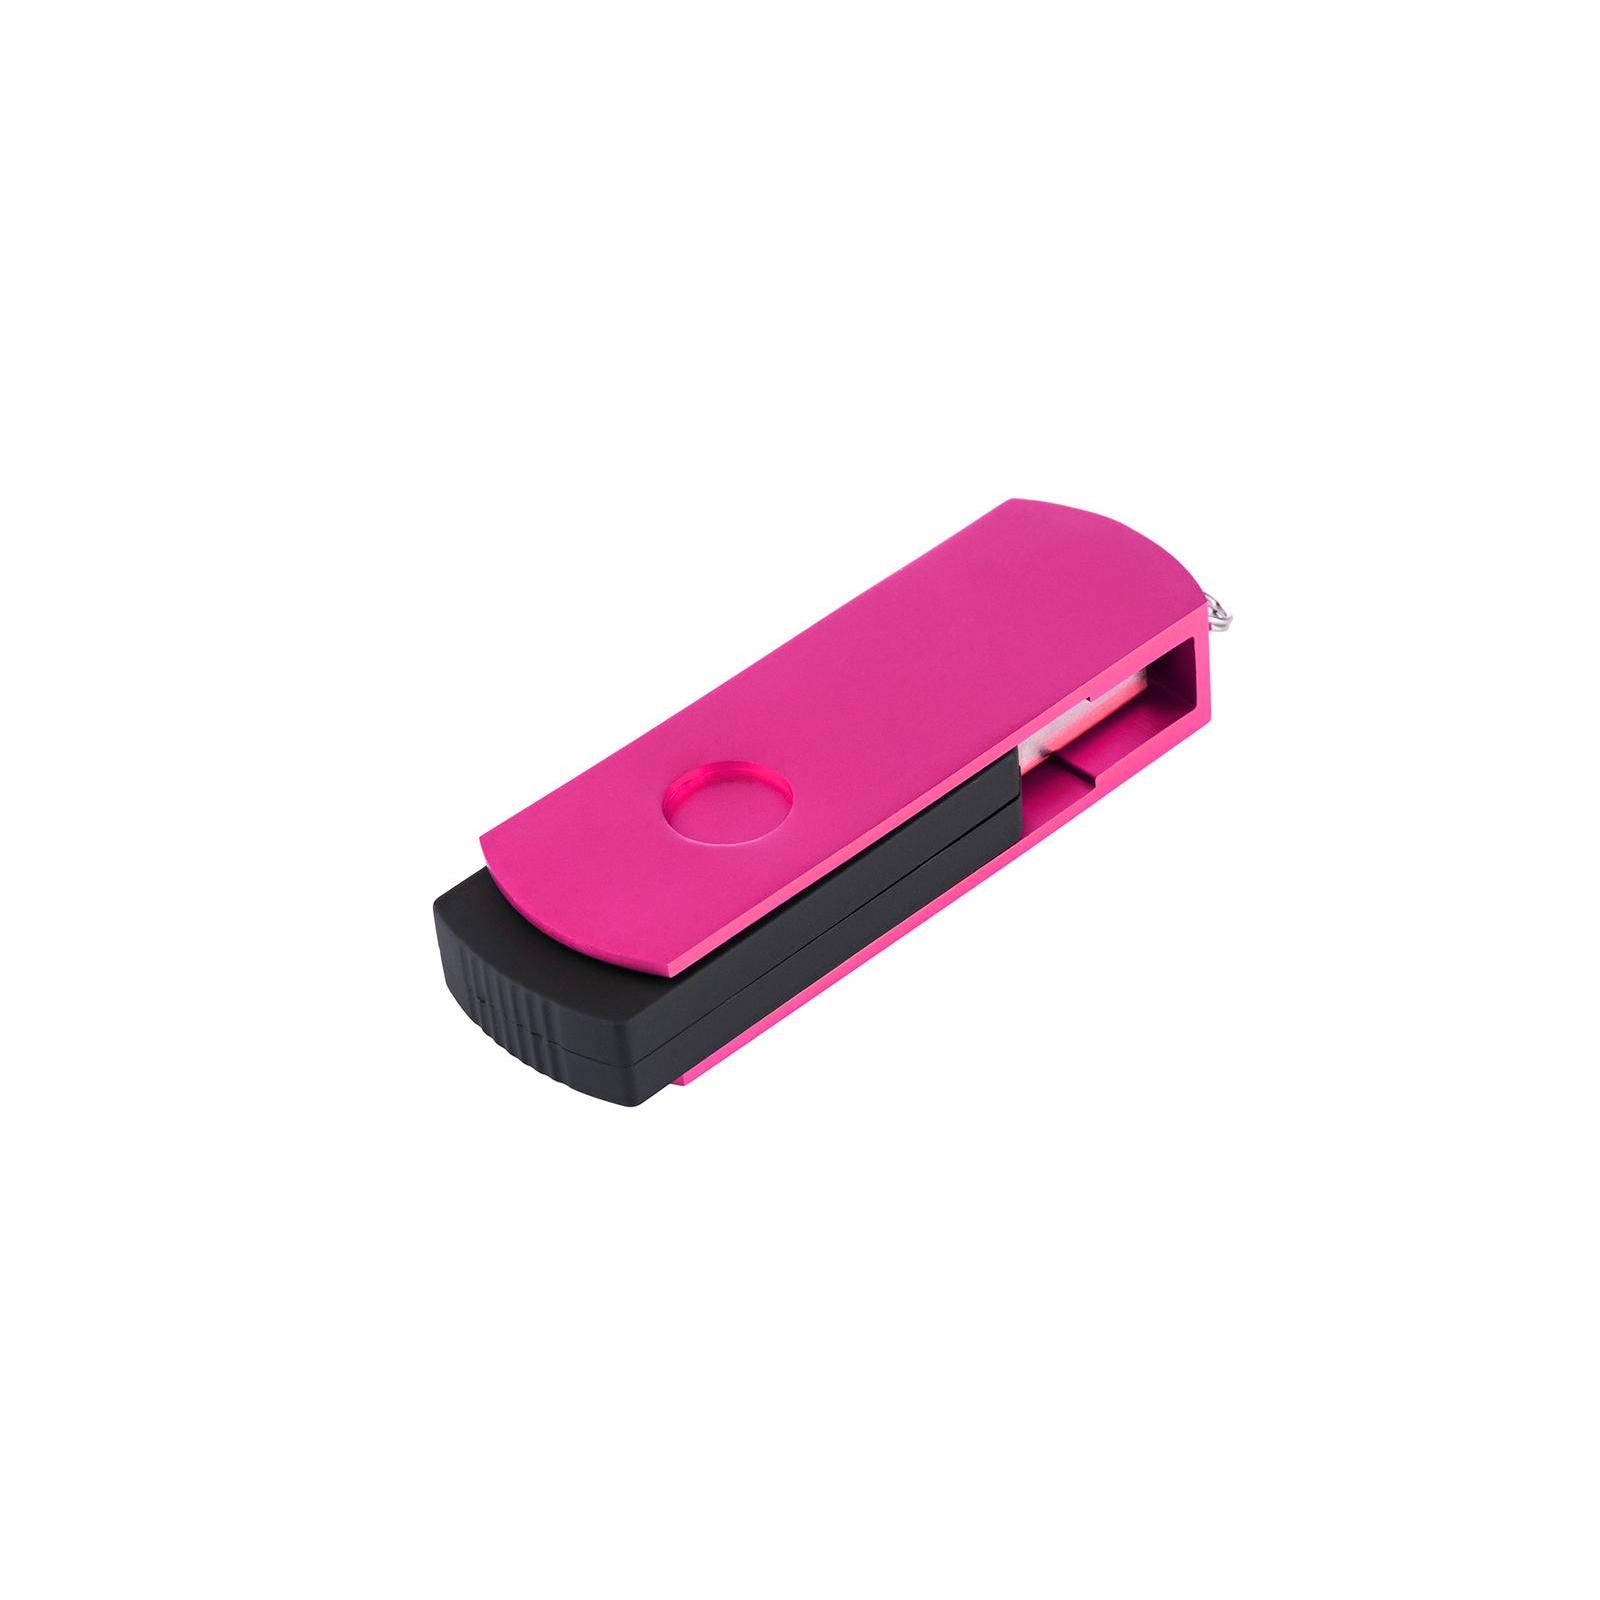 USB флеш накопитель eXceleram 16GB P2 Series Black/Black USB 3.1 Gen 1 (EXP2U3BB16) изображение 6